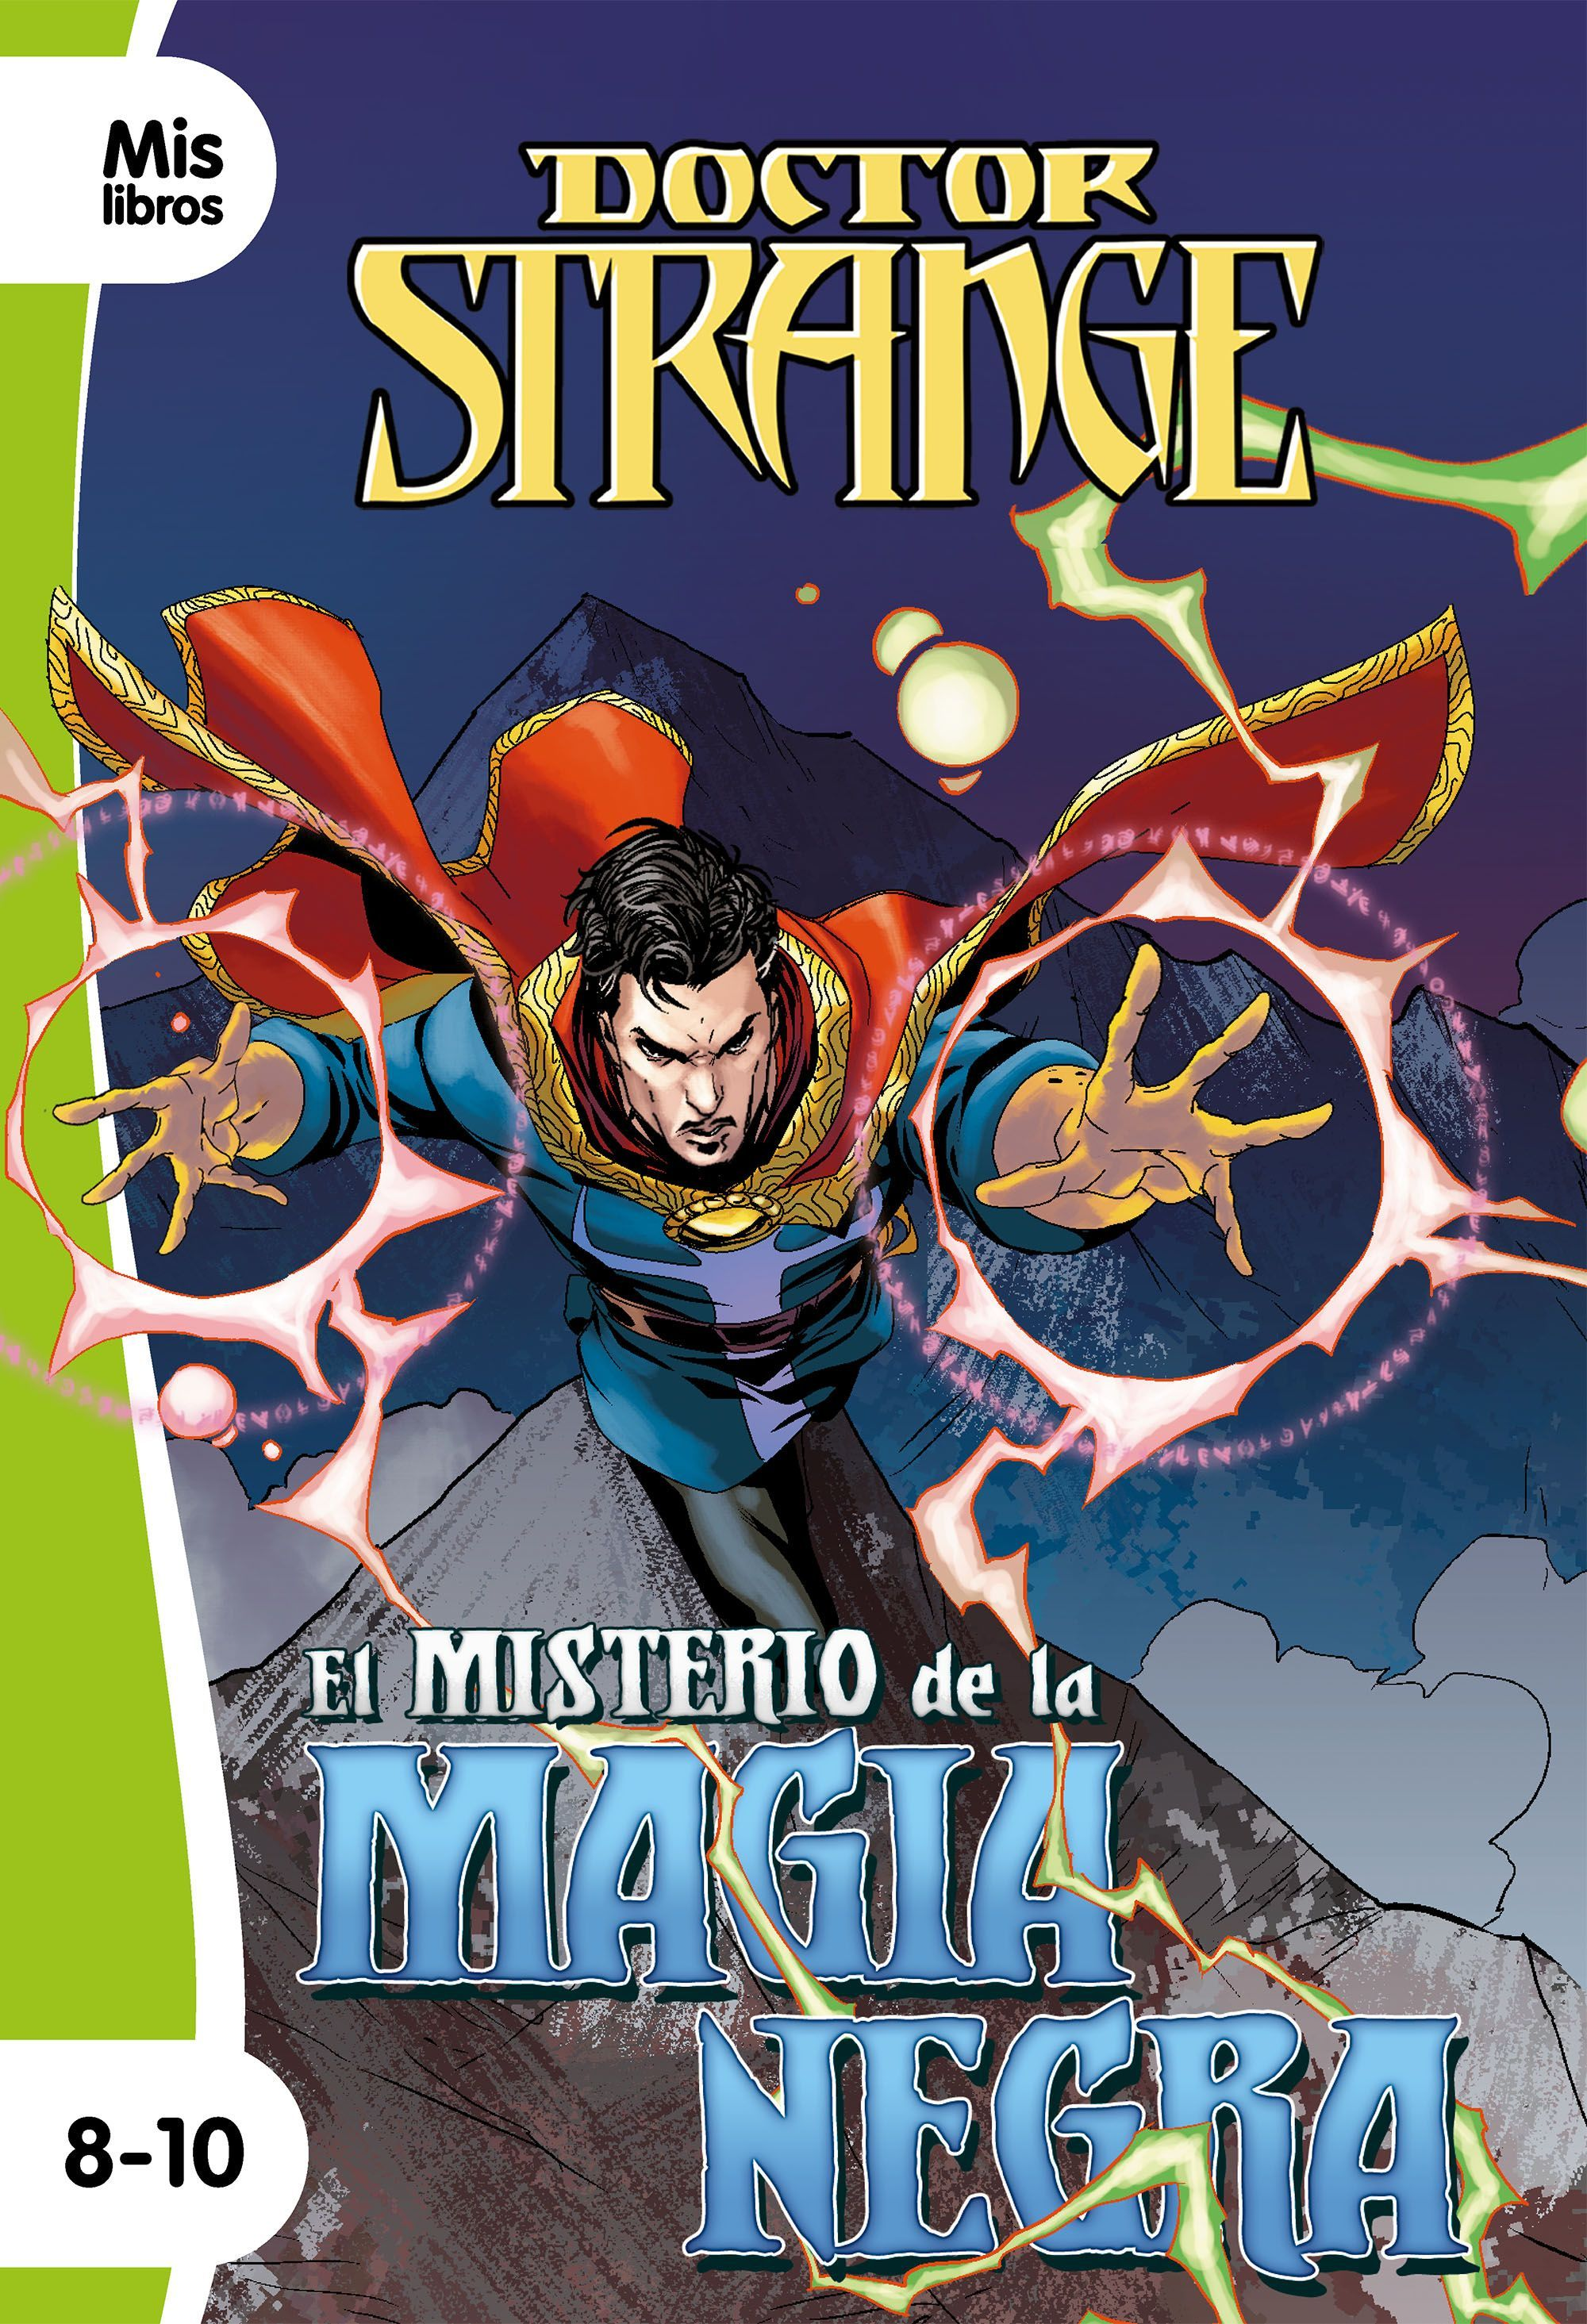 DOCTOR STRANGE EL MISTERIO DE LA MAGIA NEGRA